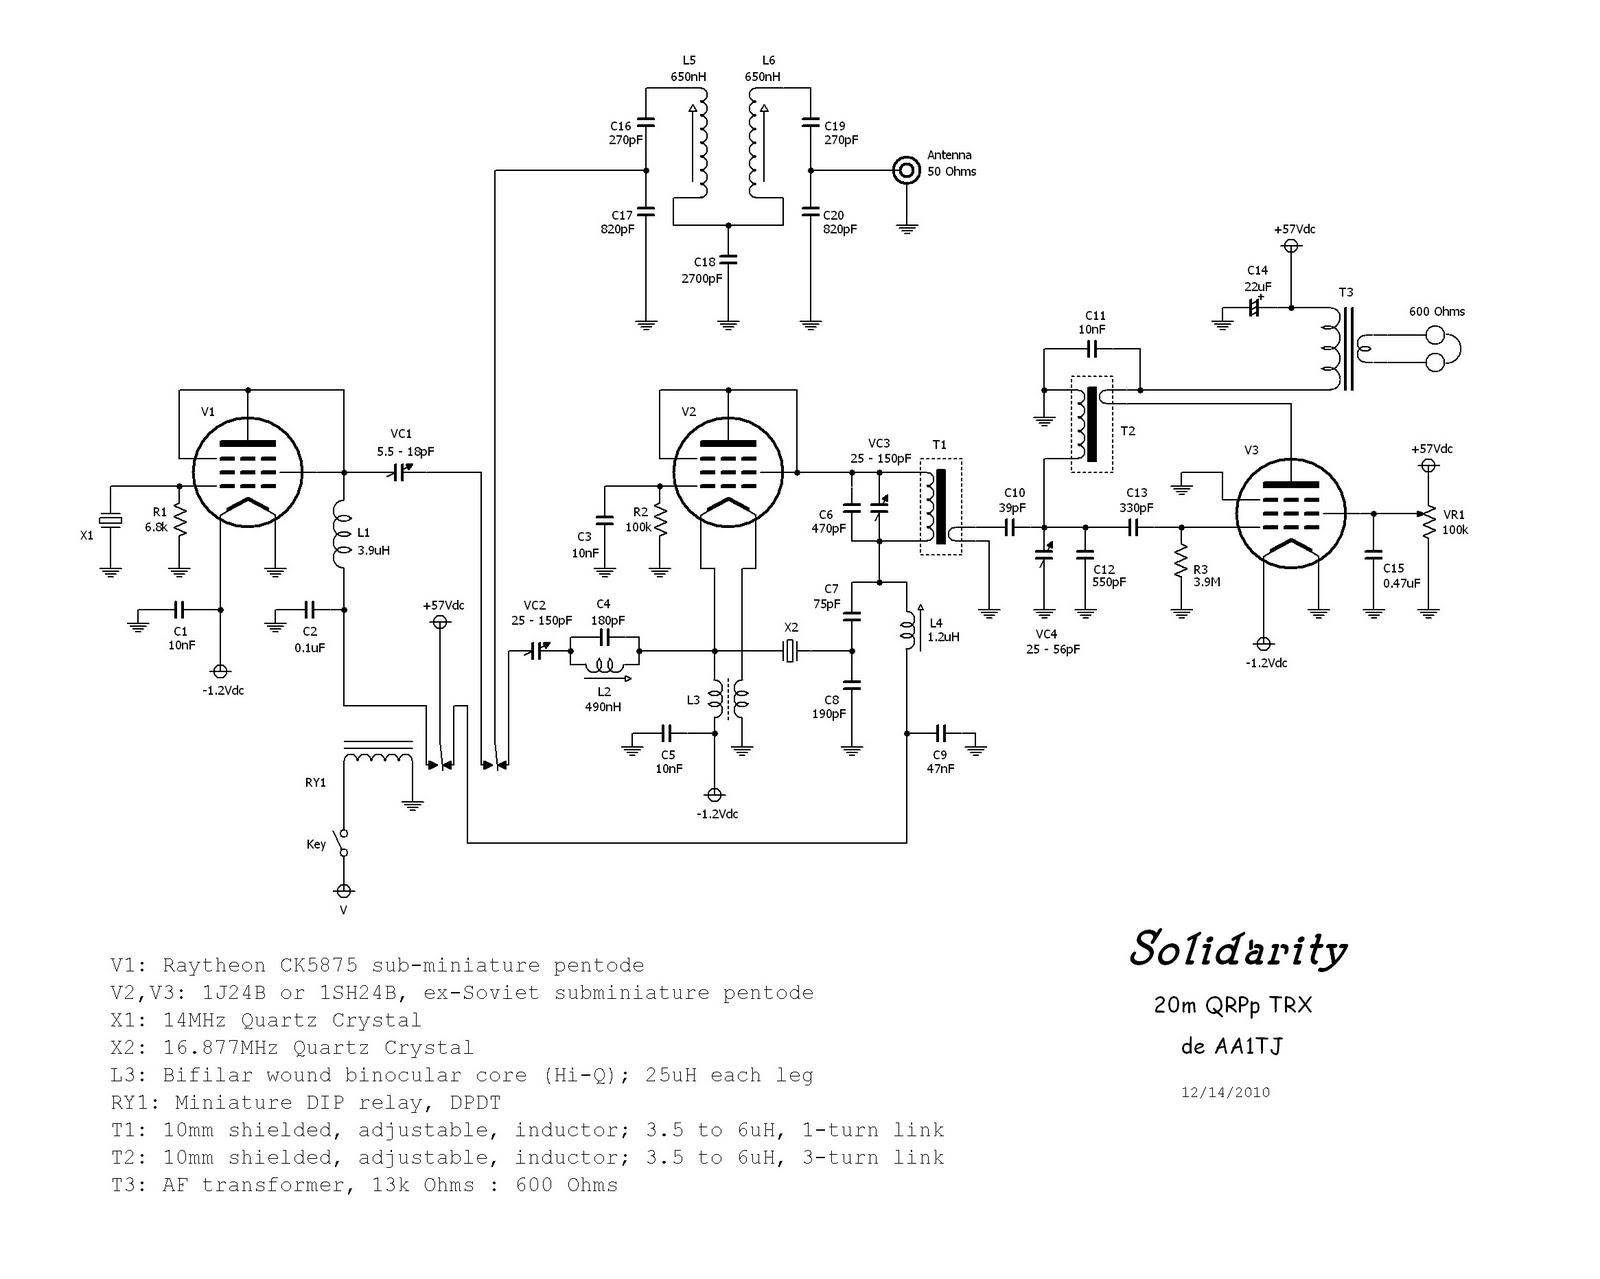 m1kta s qrp ham radio blog hro 5 and russian pencil valves Headlight Wiring Diagram dl3jin de tx 1x 1p24b htm